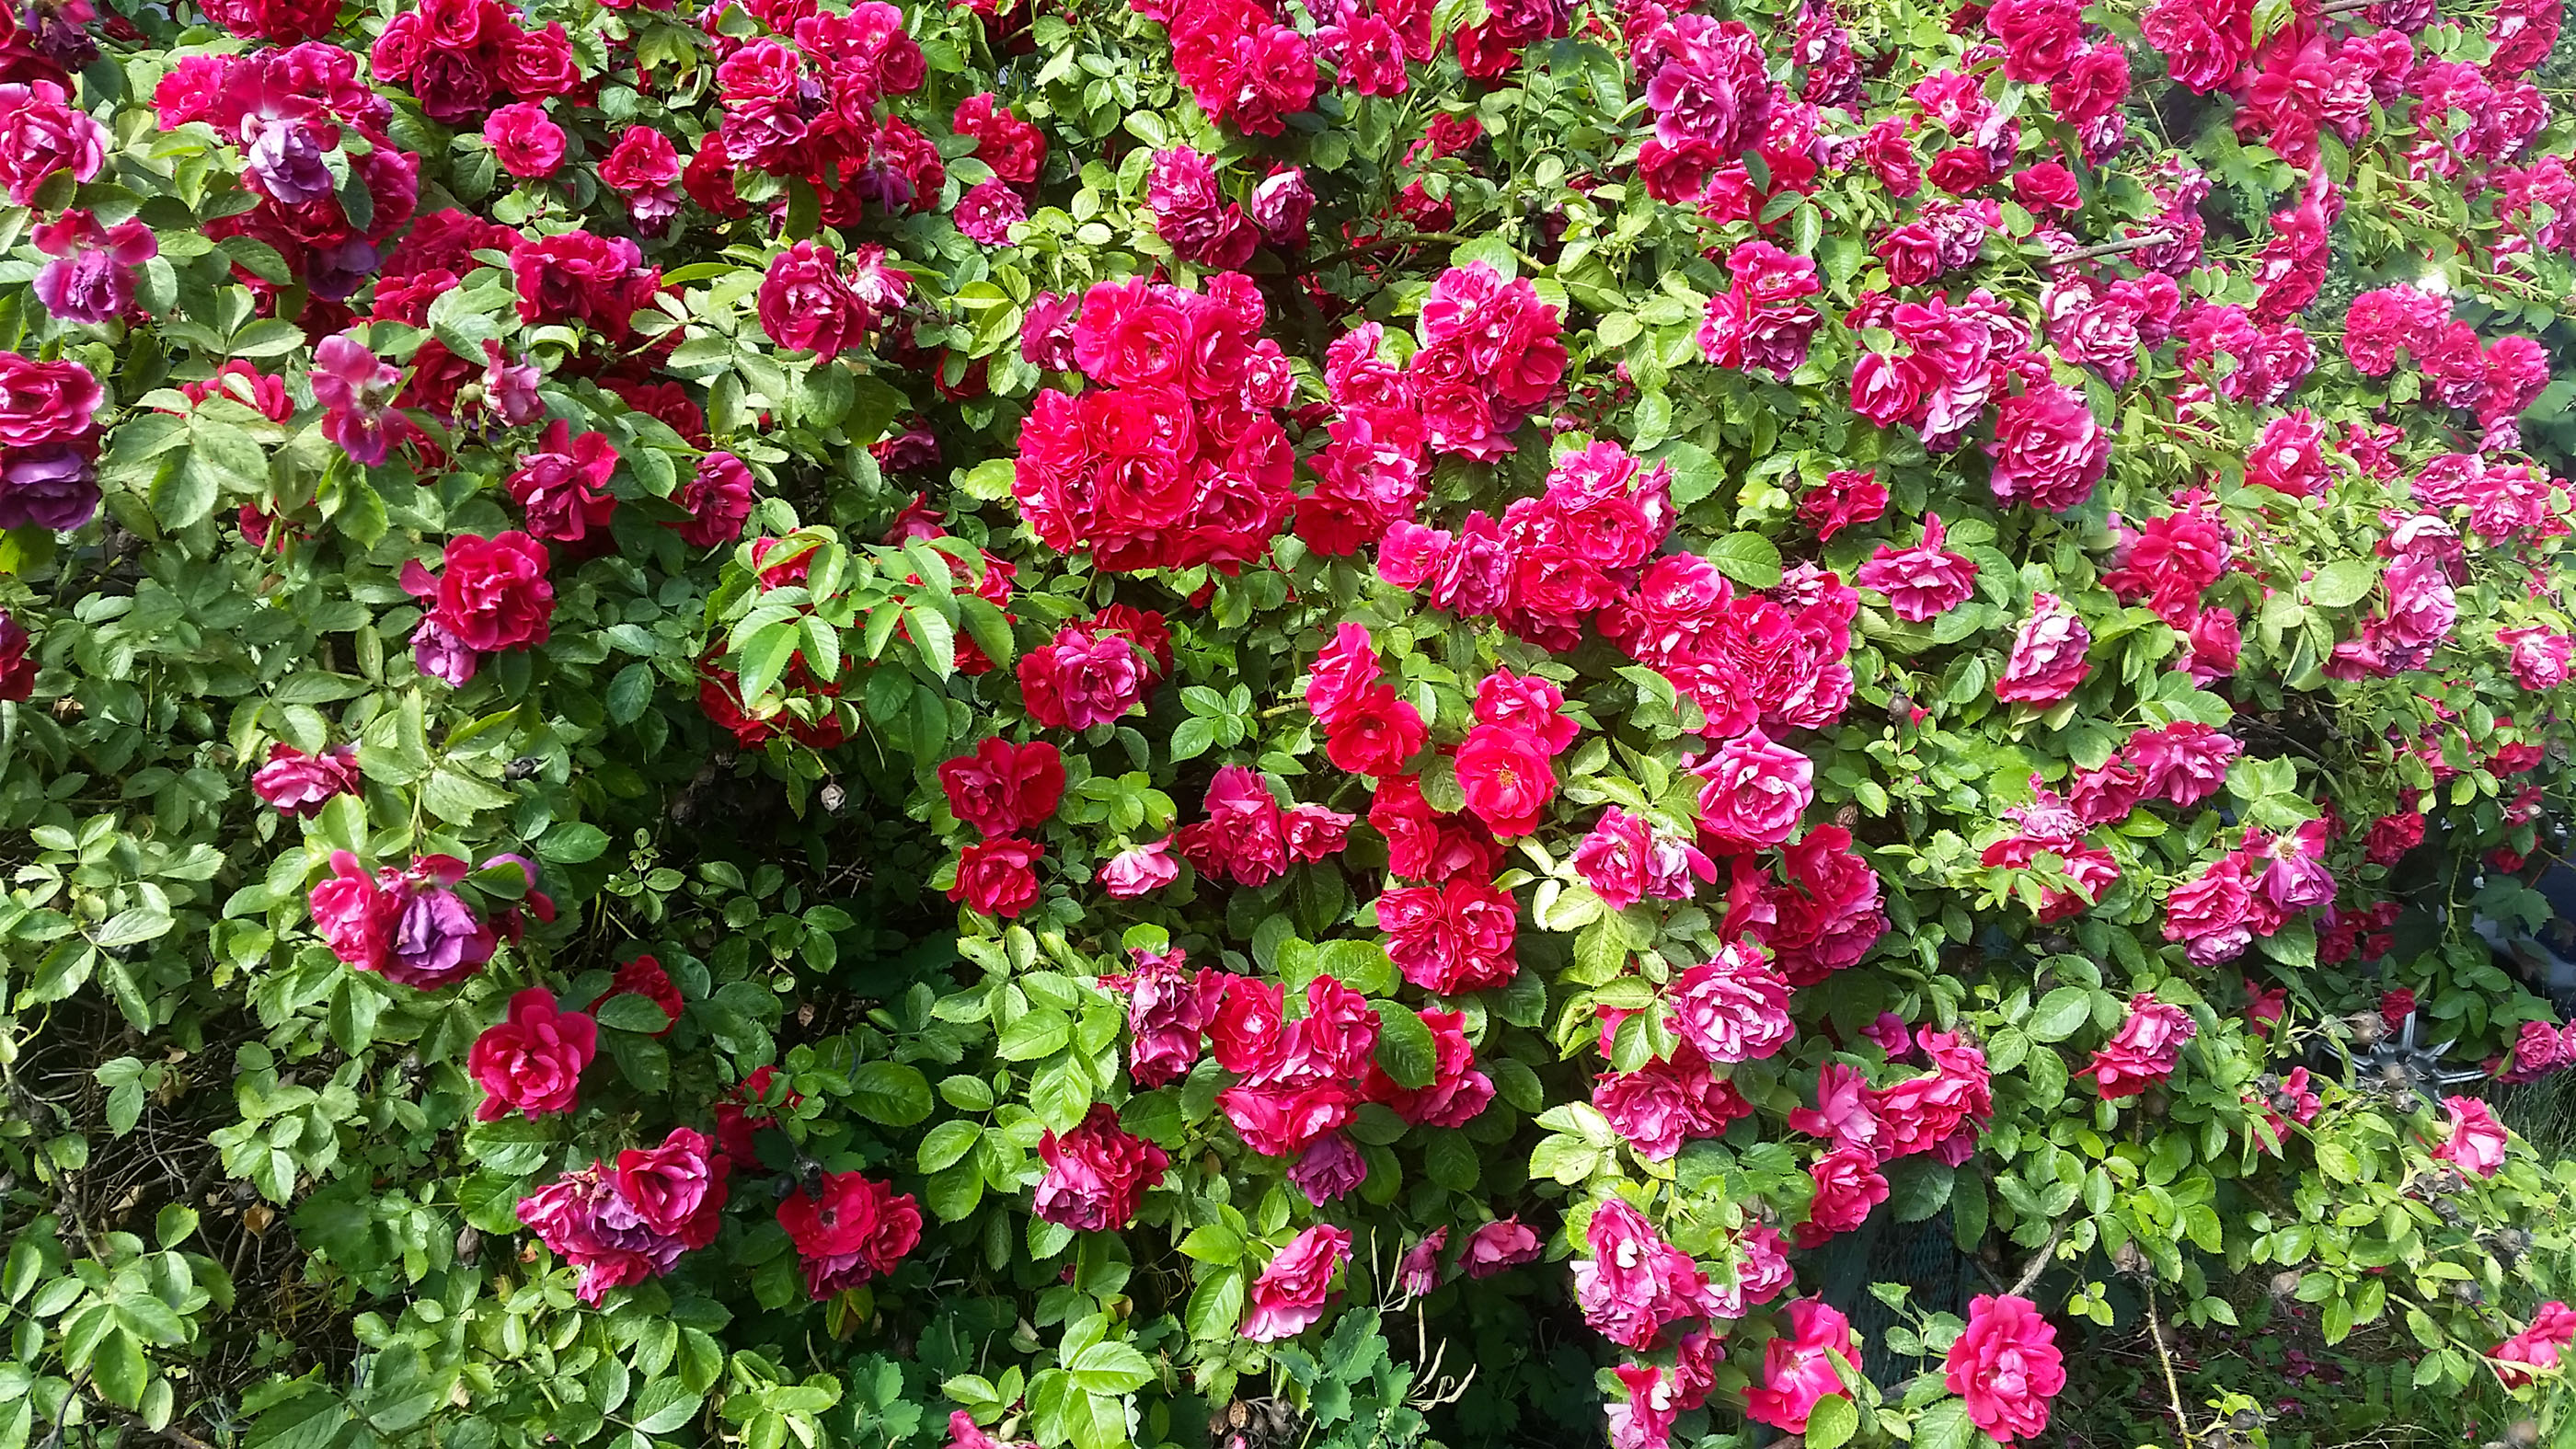 Gėlė Erškėtrožė